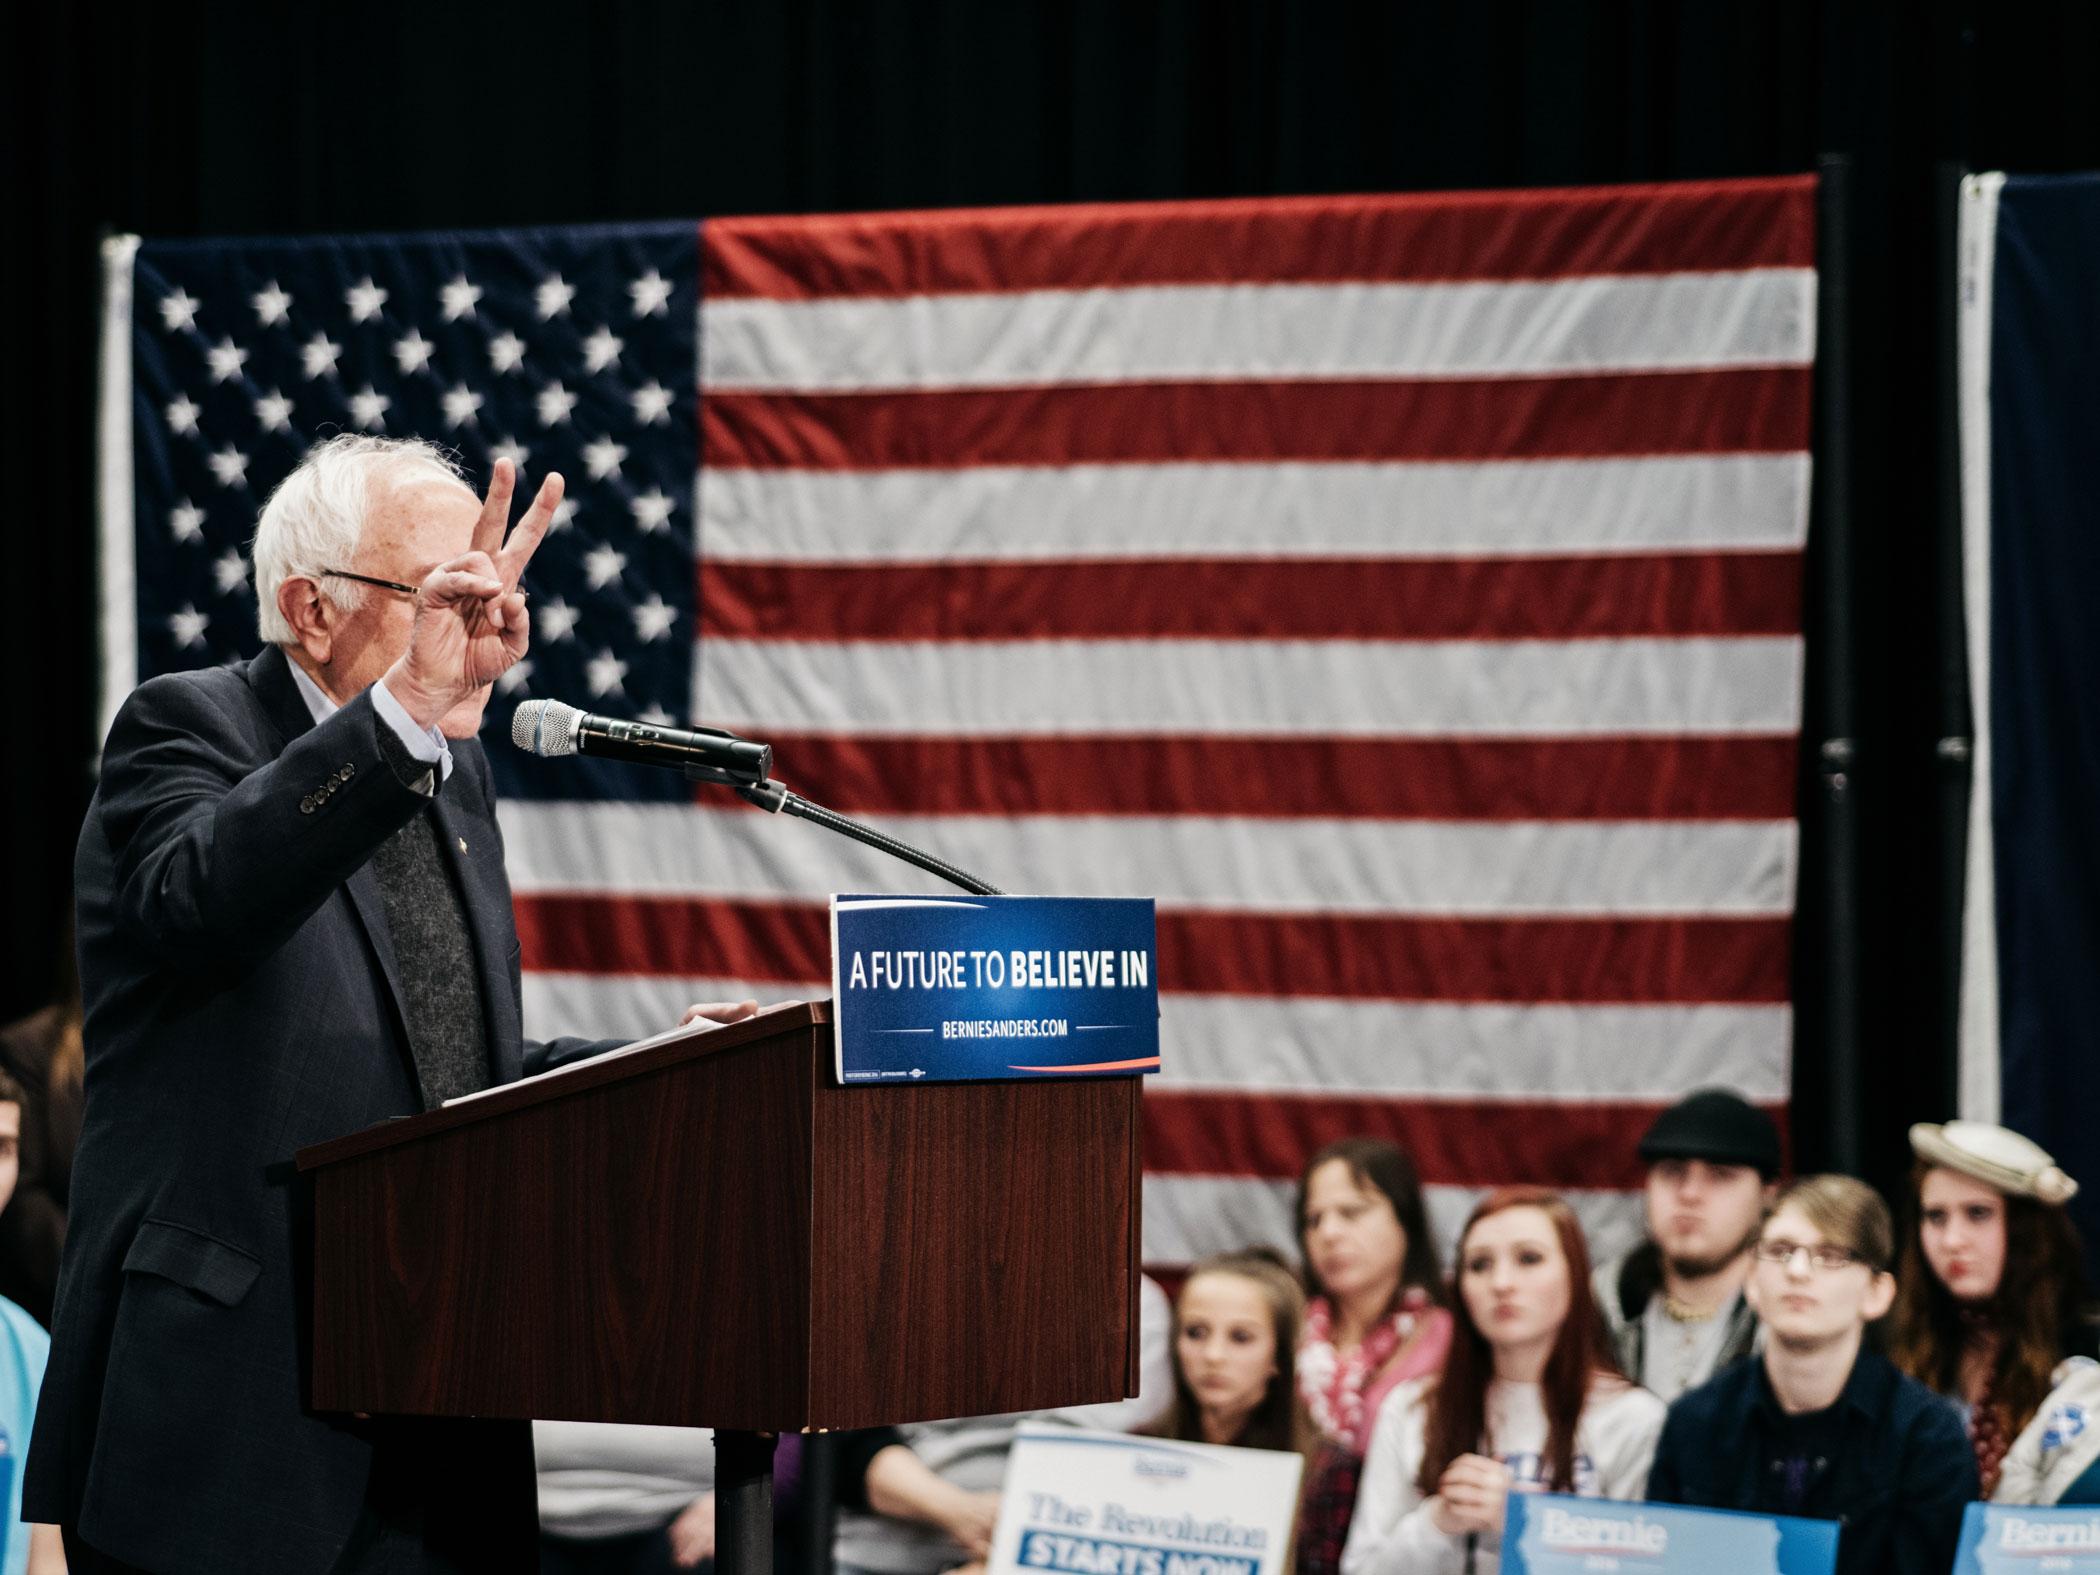 Sen. Bernie Sanders, I-Vt., speaks at a campaign event in Iowa on Jan. 24, 2016.